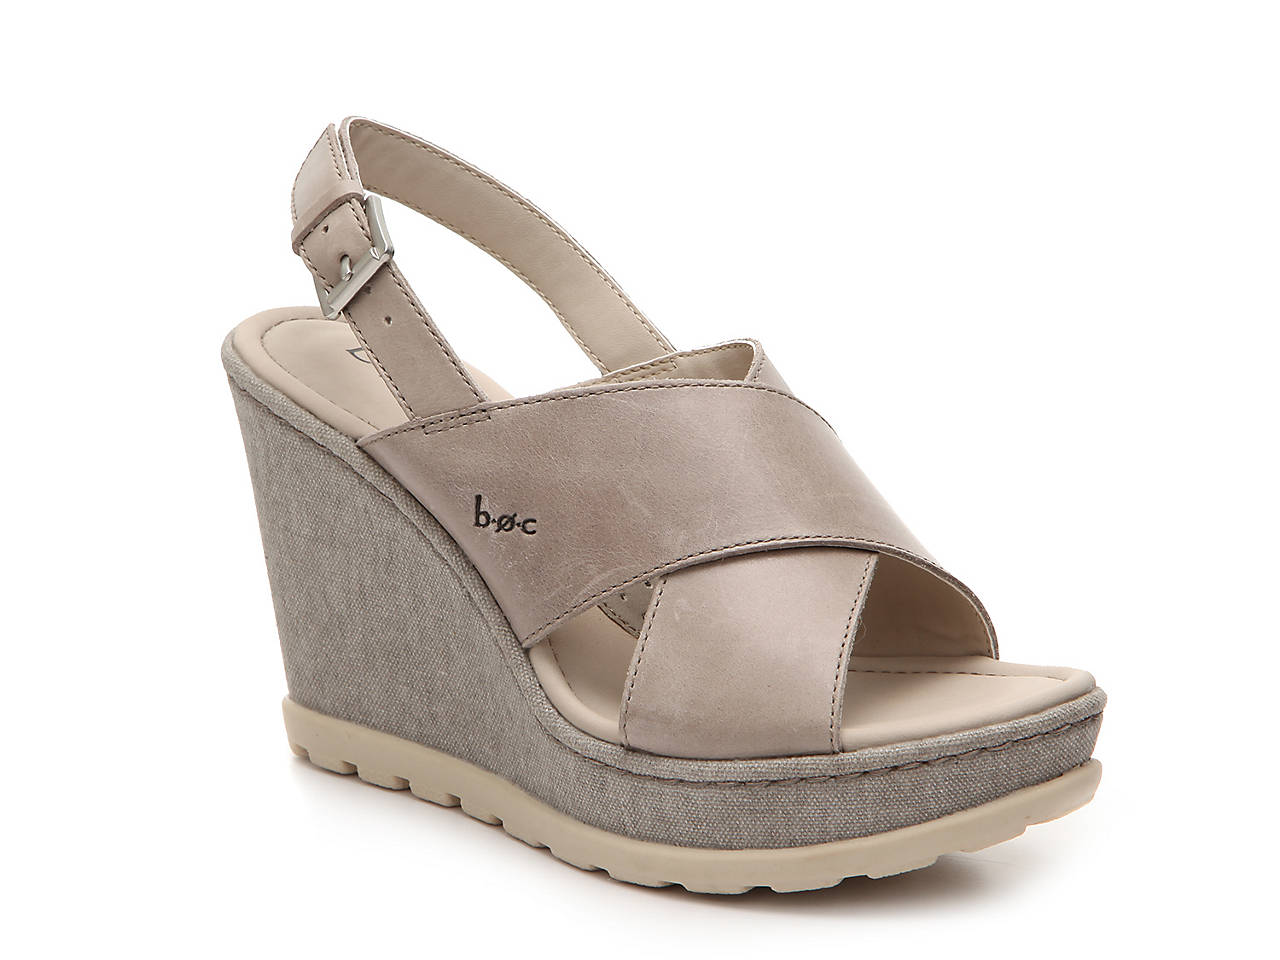 2bfc3e3fd7e b.o.c Dannah Wedge Sandal Men s Shoes